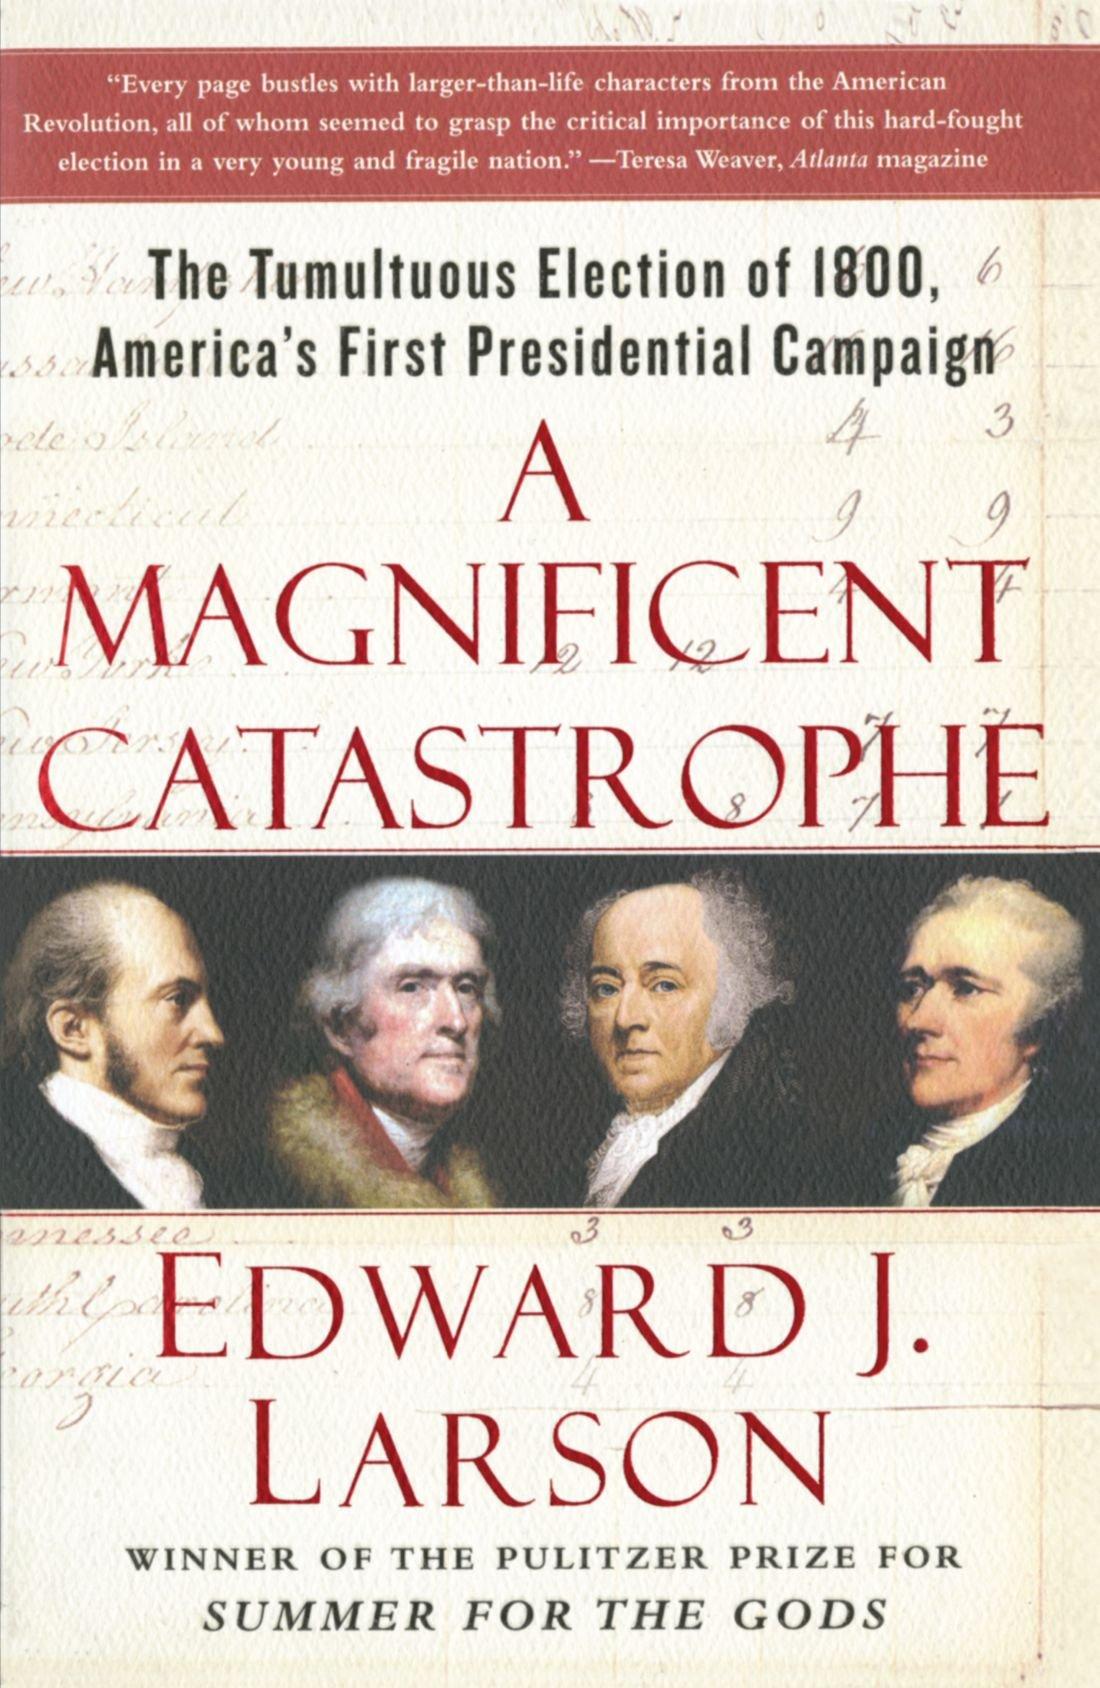 a magnificent catastrophe the tumultuous election of 1800